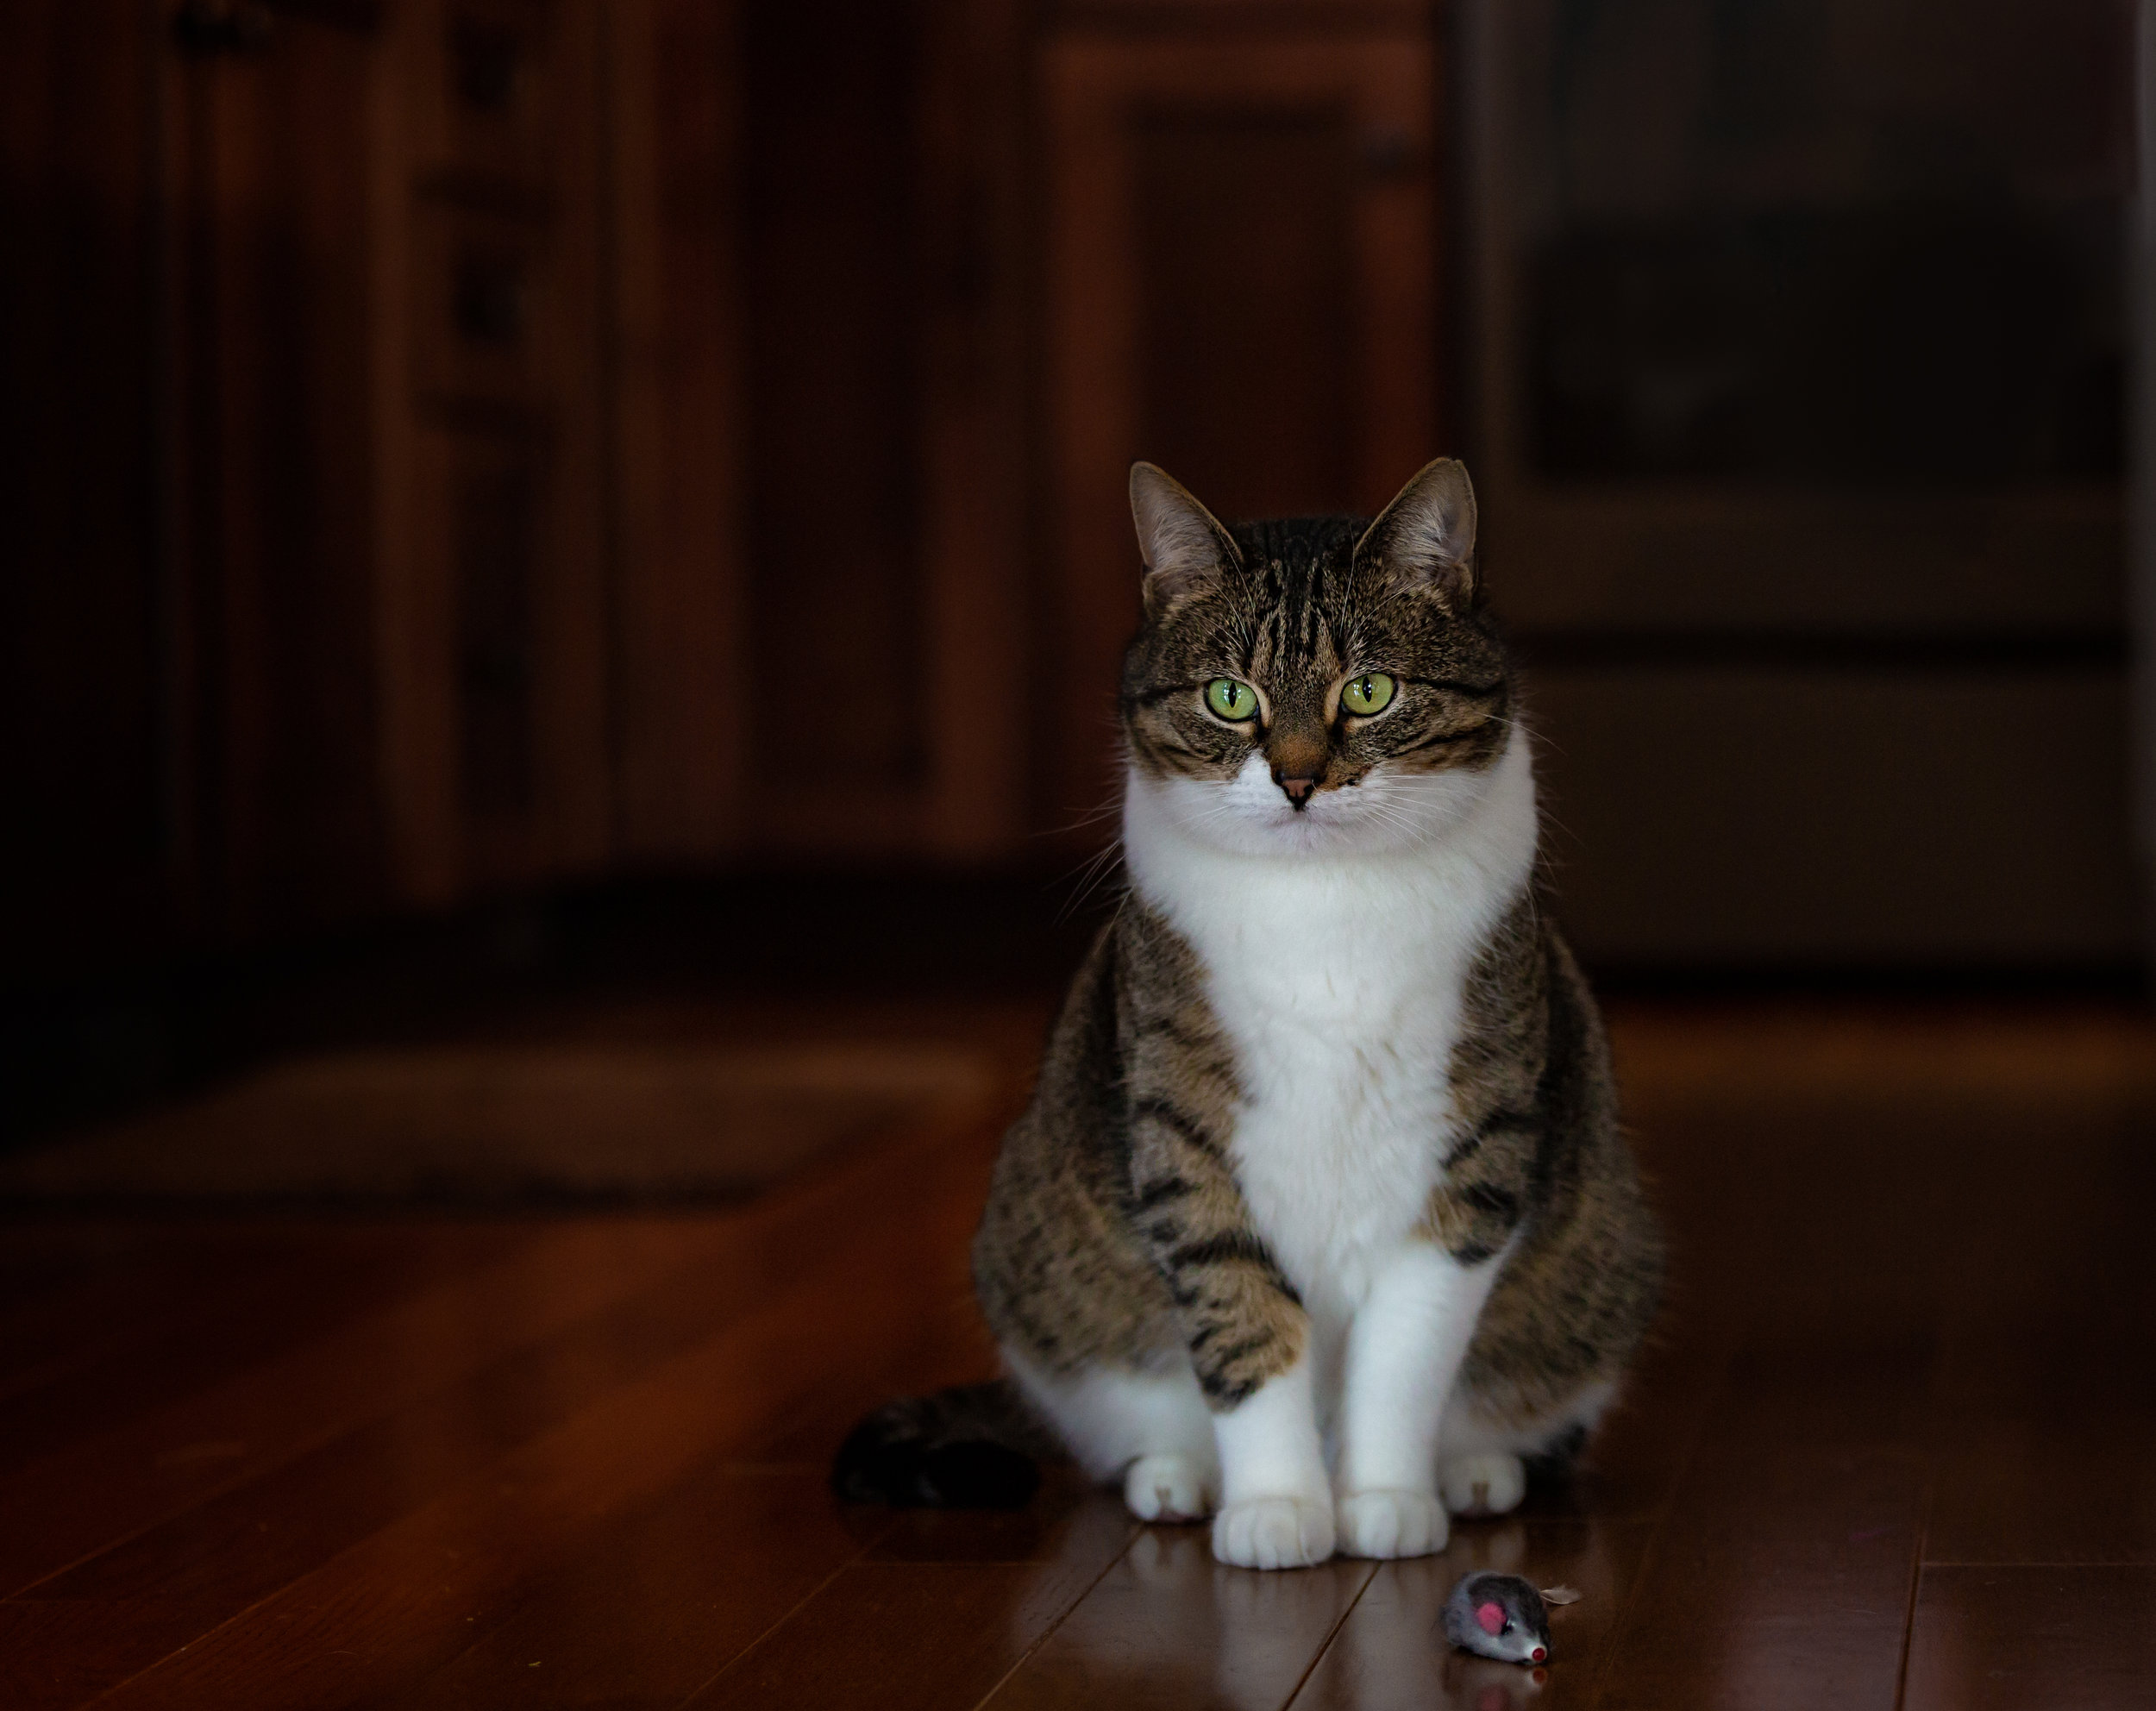 Northern Connecticut cat photographer